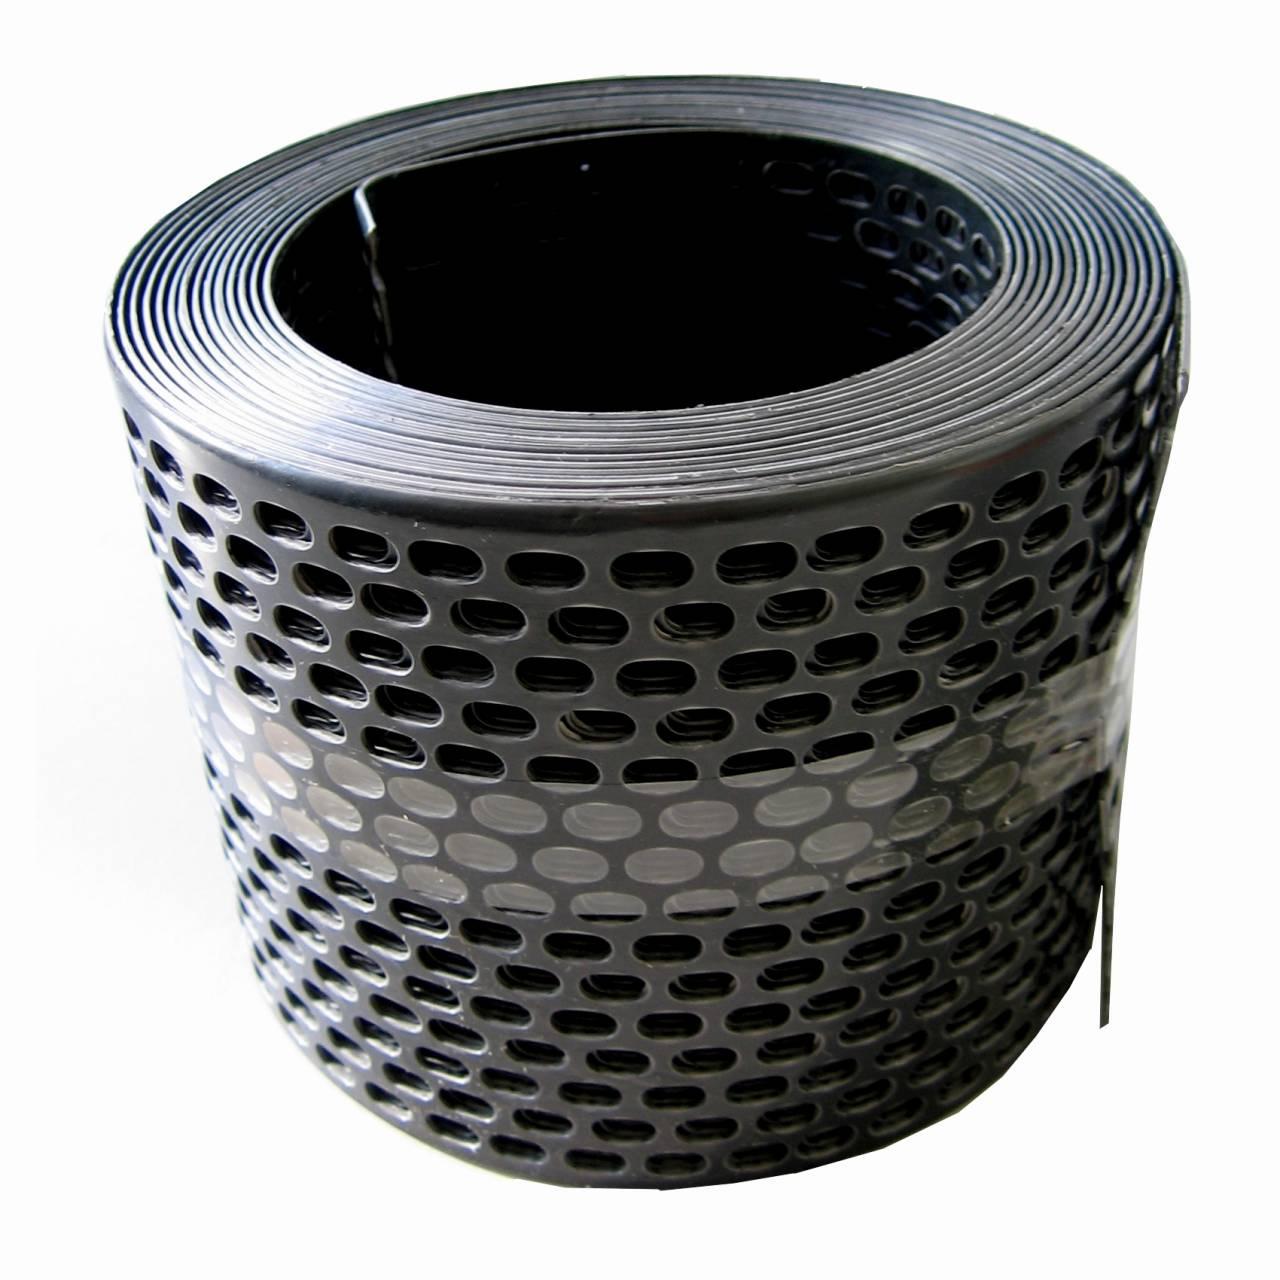 Traufgitter 80 mm schwarz / Rolle a 5 lfm